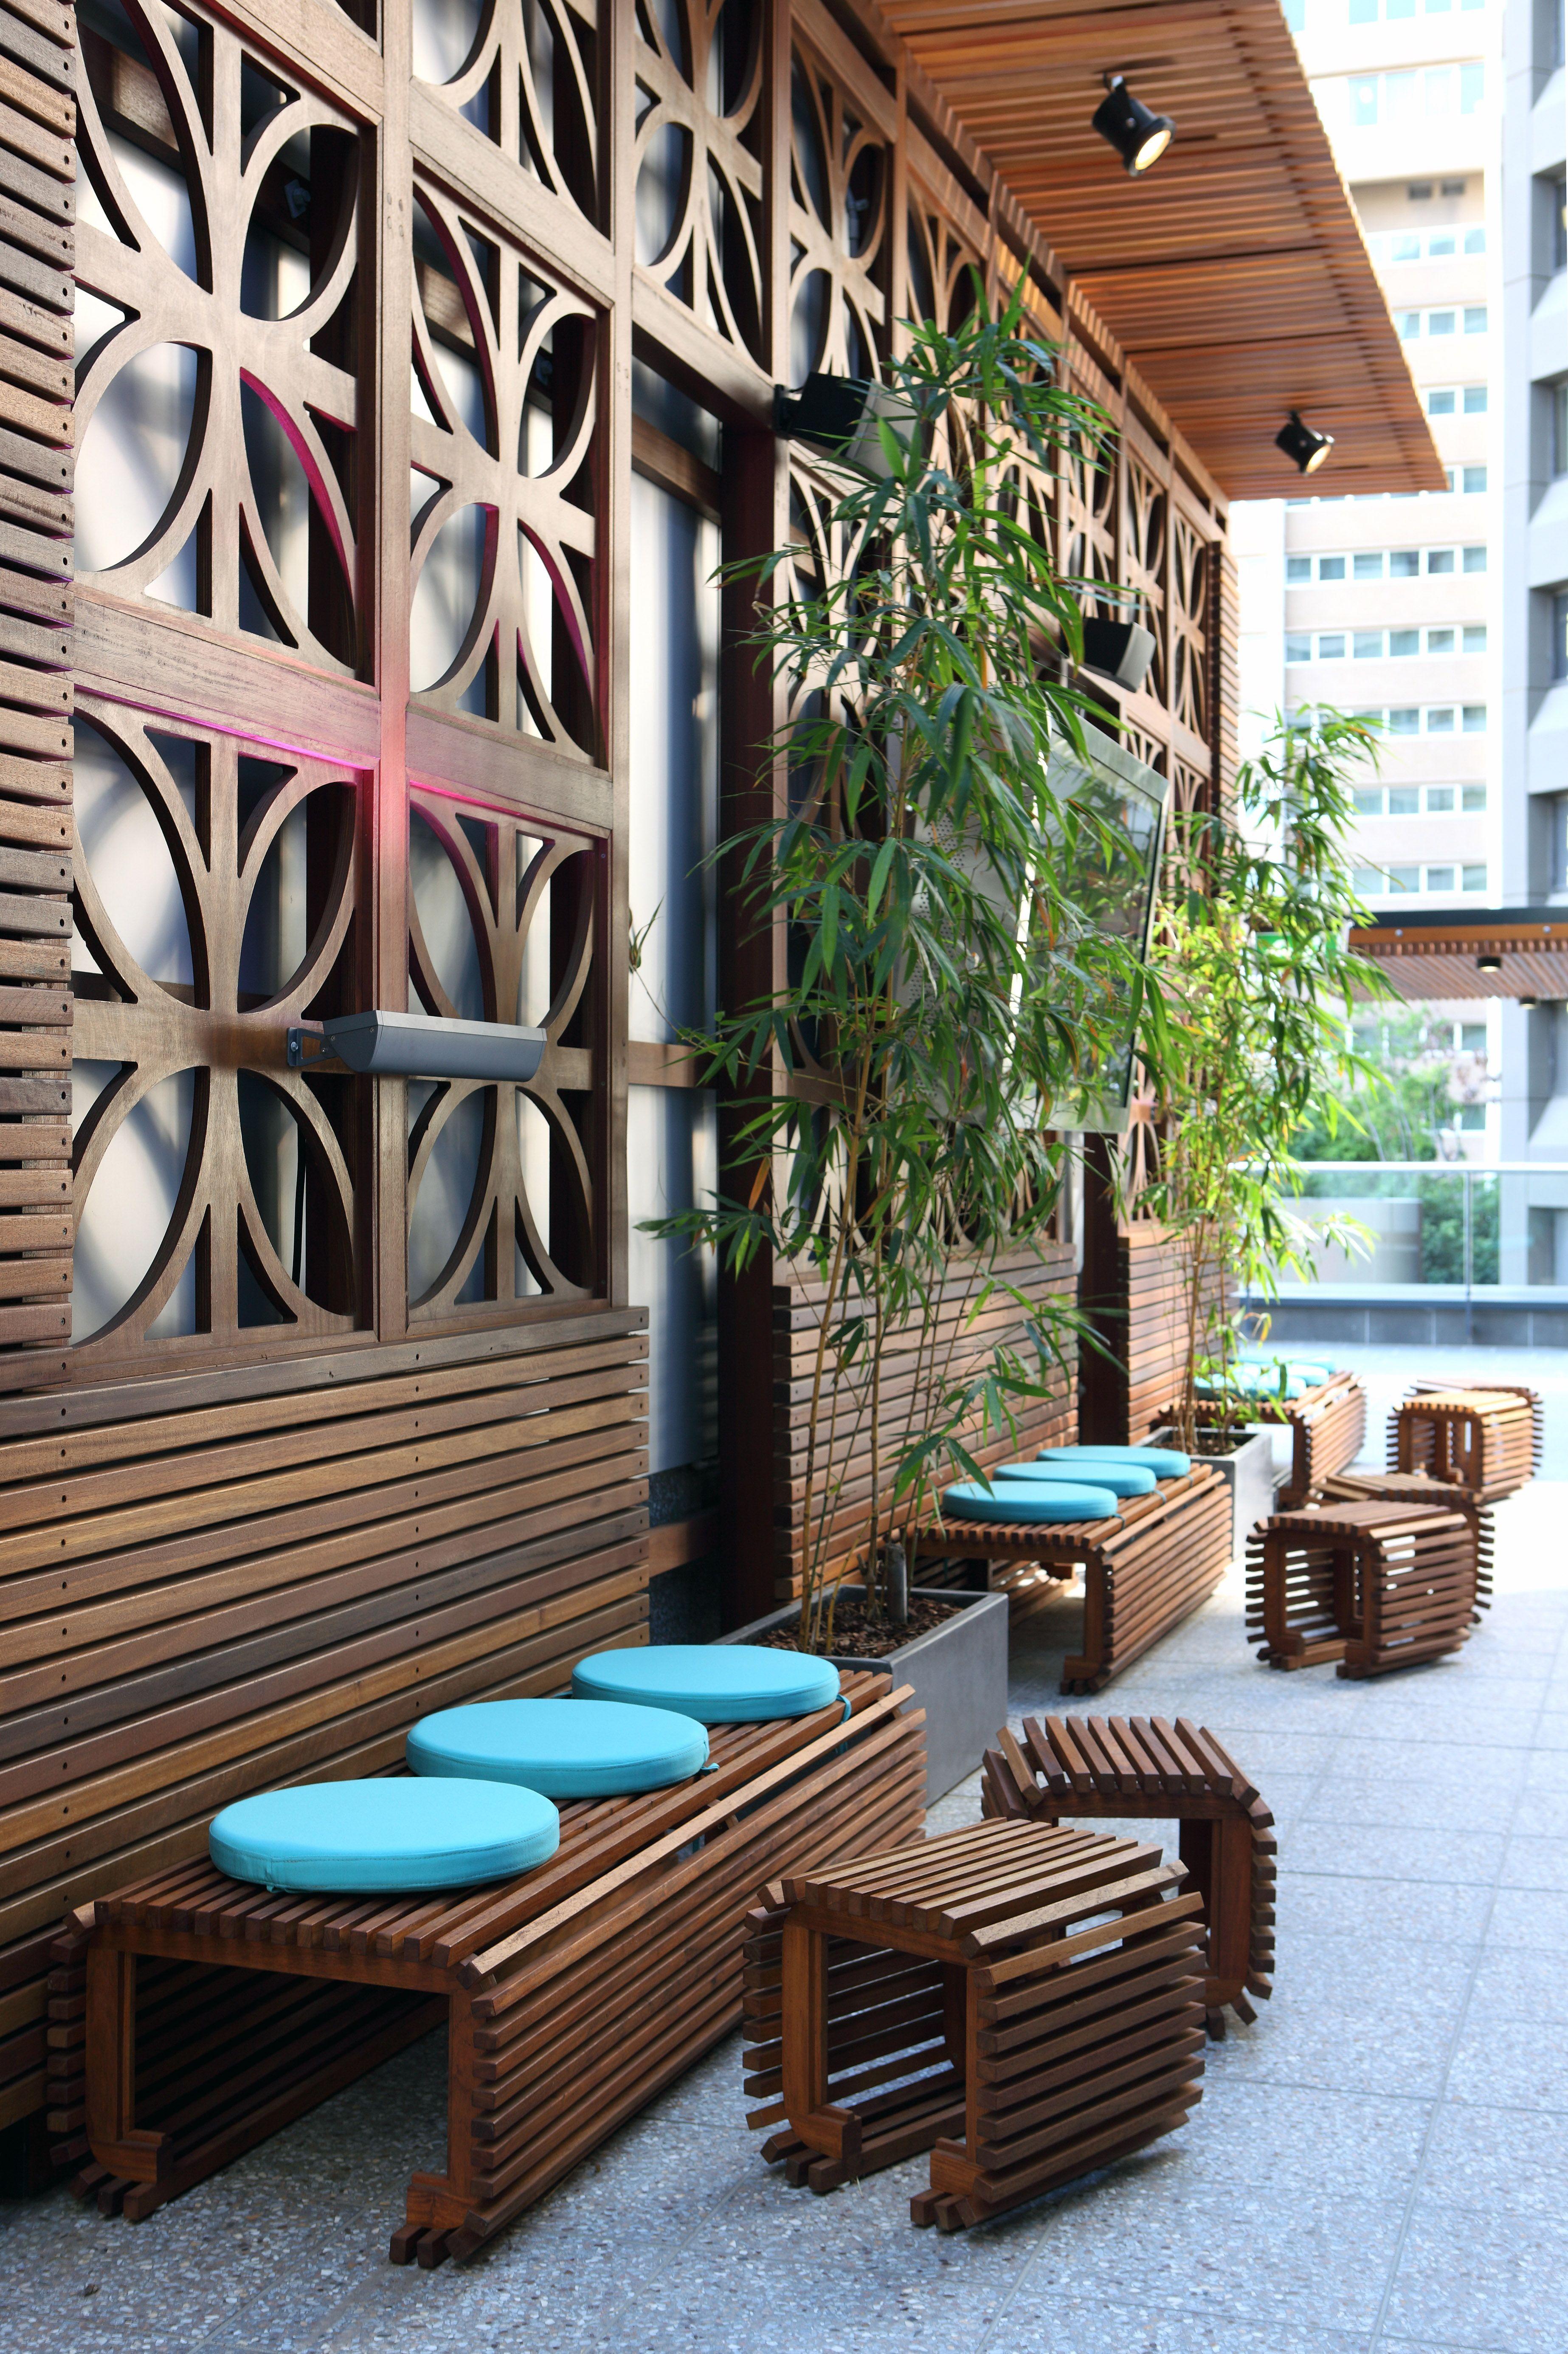 Pdt Architects Telstra Urban Retreat Interior Design Landscape Archit Archit Architects Commercialpodium Design In 2020 Outdoor Decor Design Patio